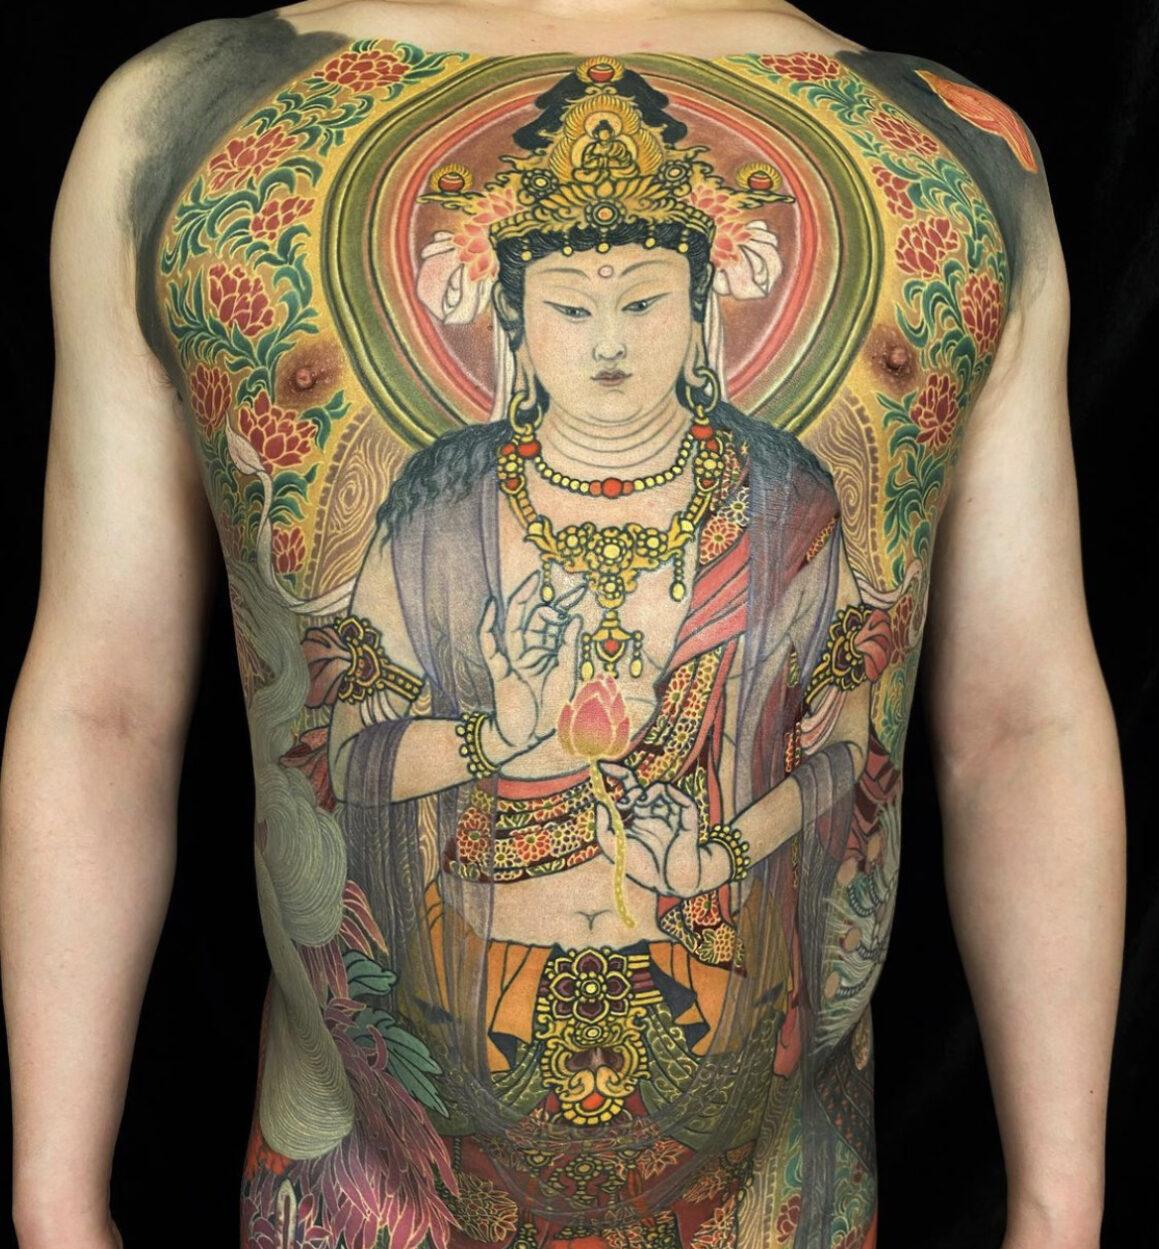 Tattoo by Shige, @shige_yellowblaze